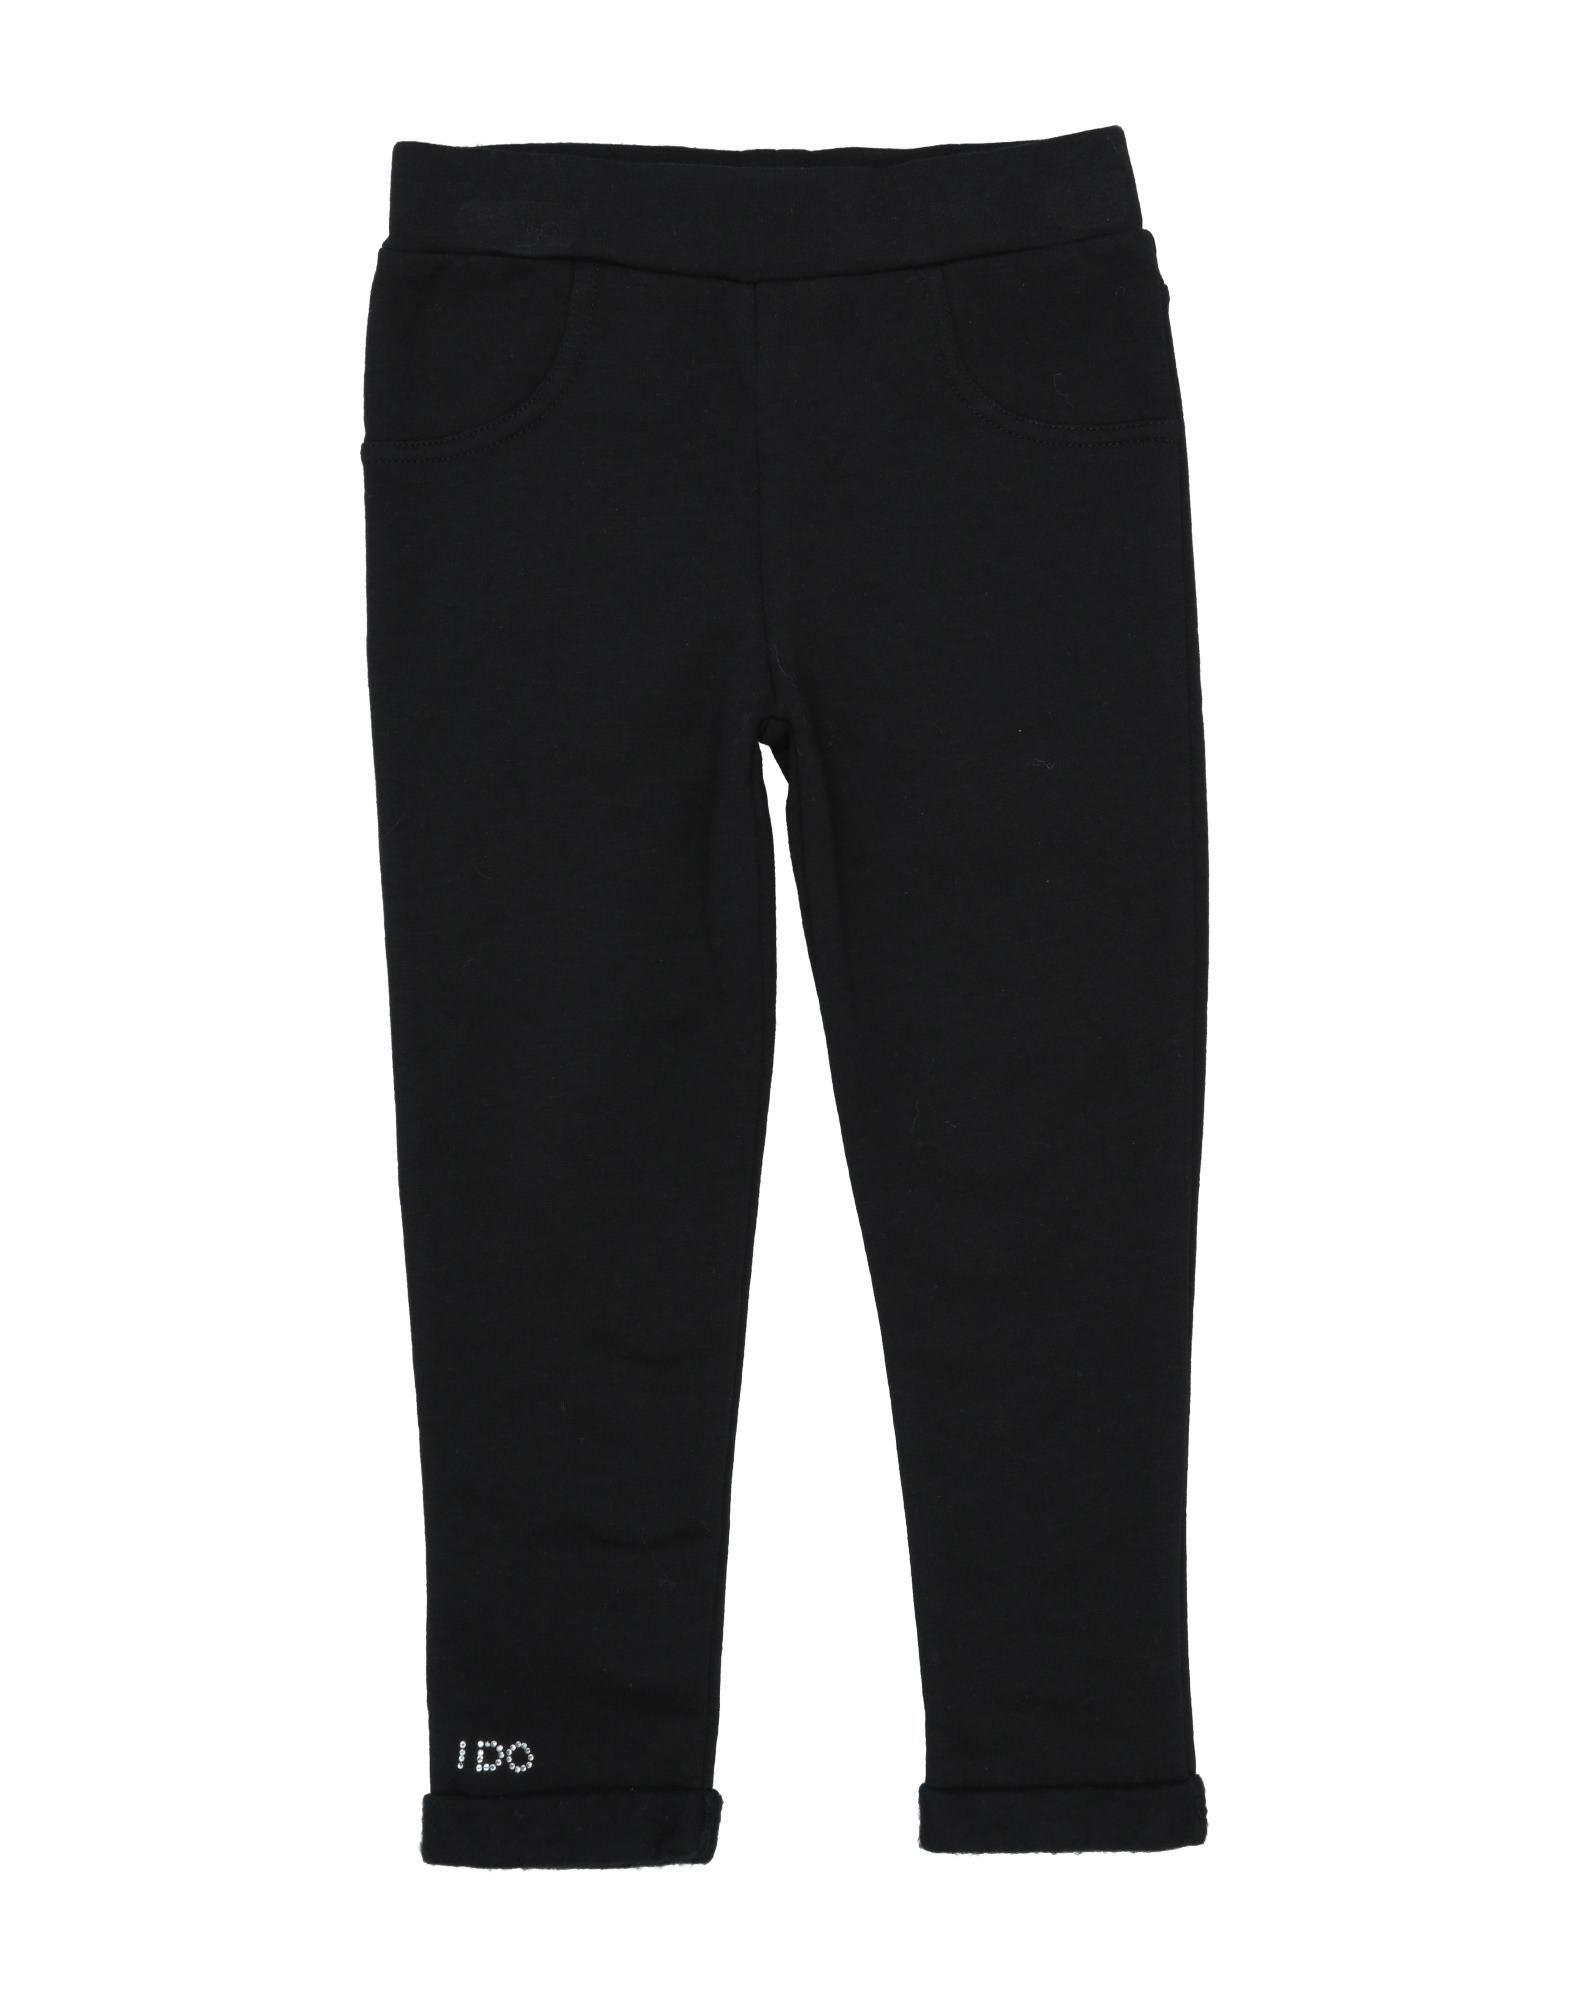 Ido By Miniconf Kids' Leggings In Black